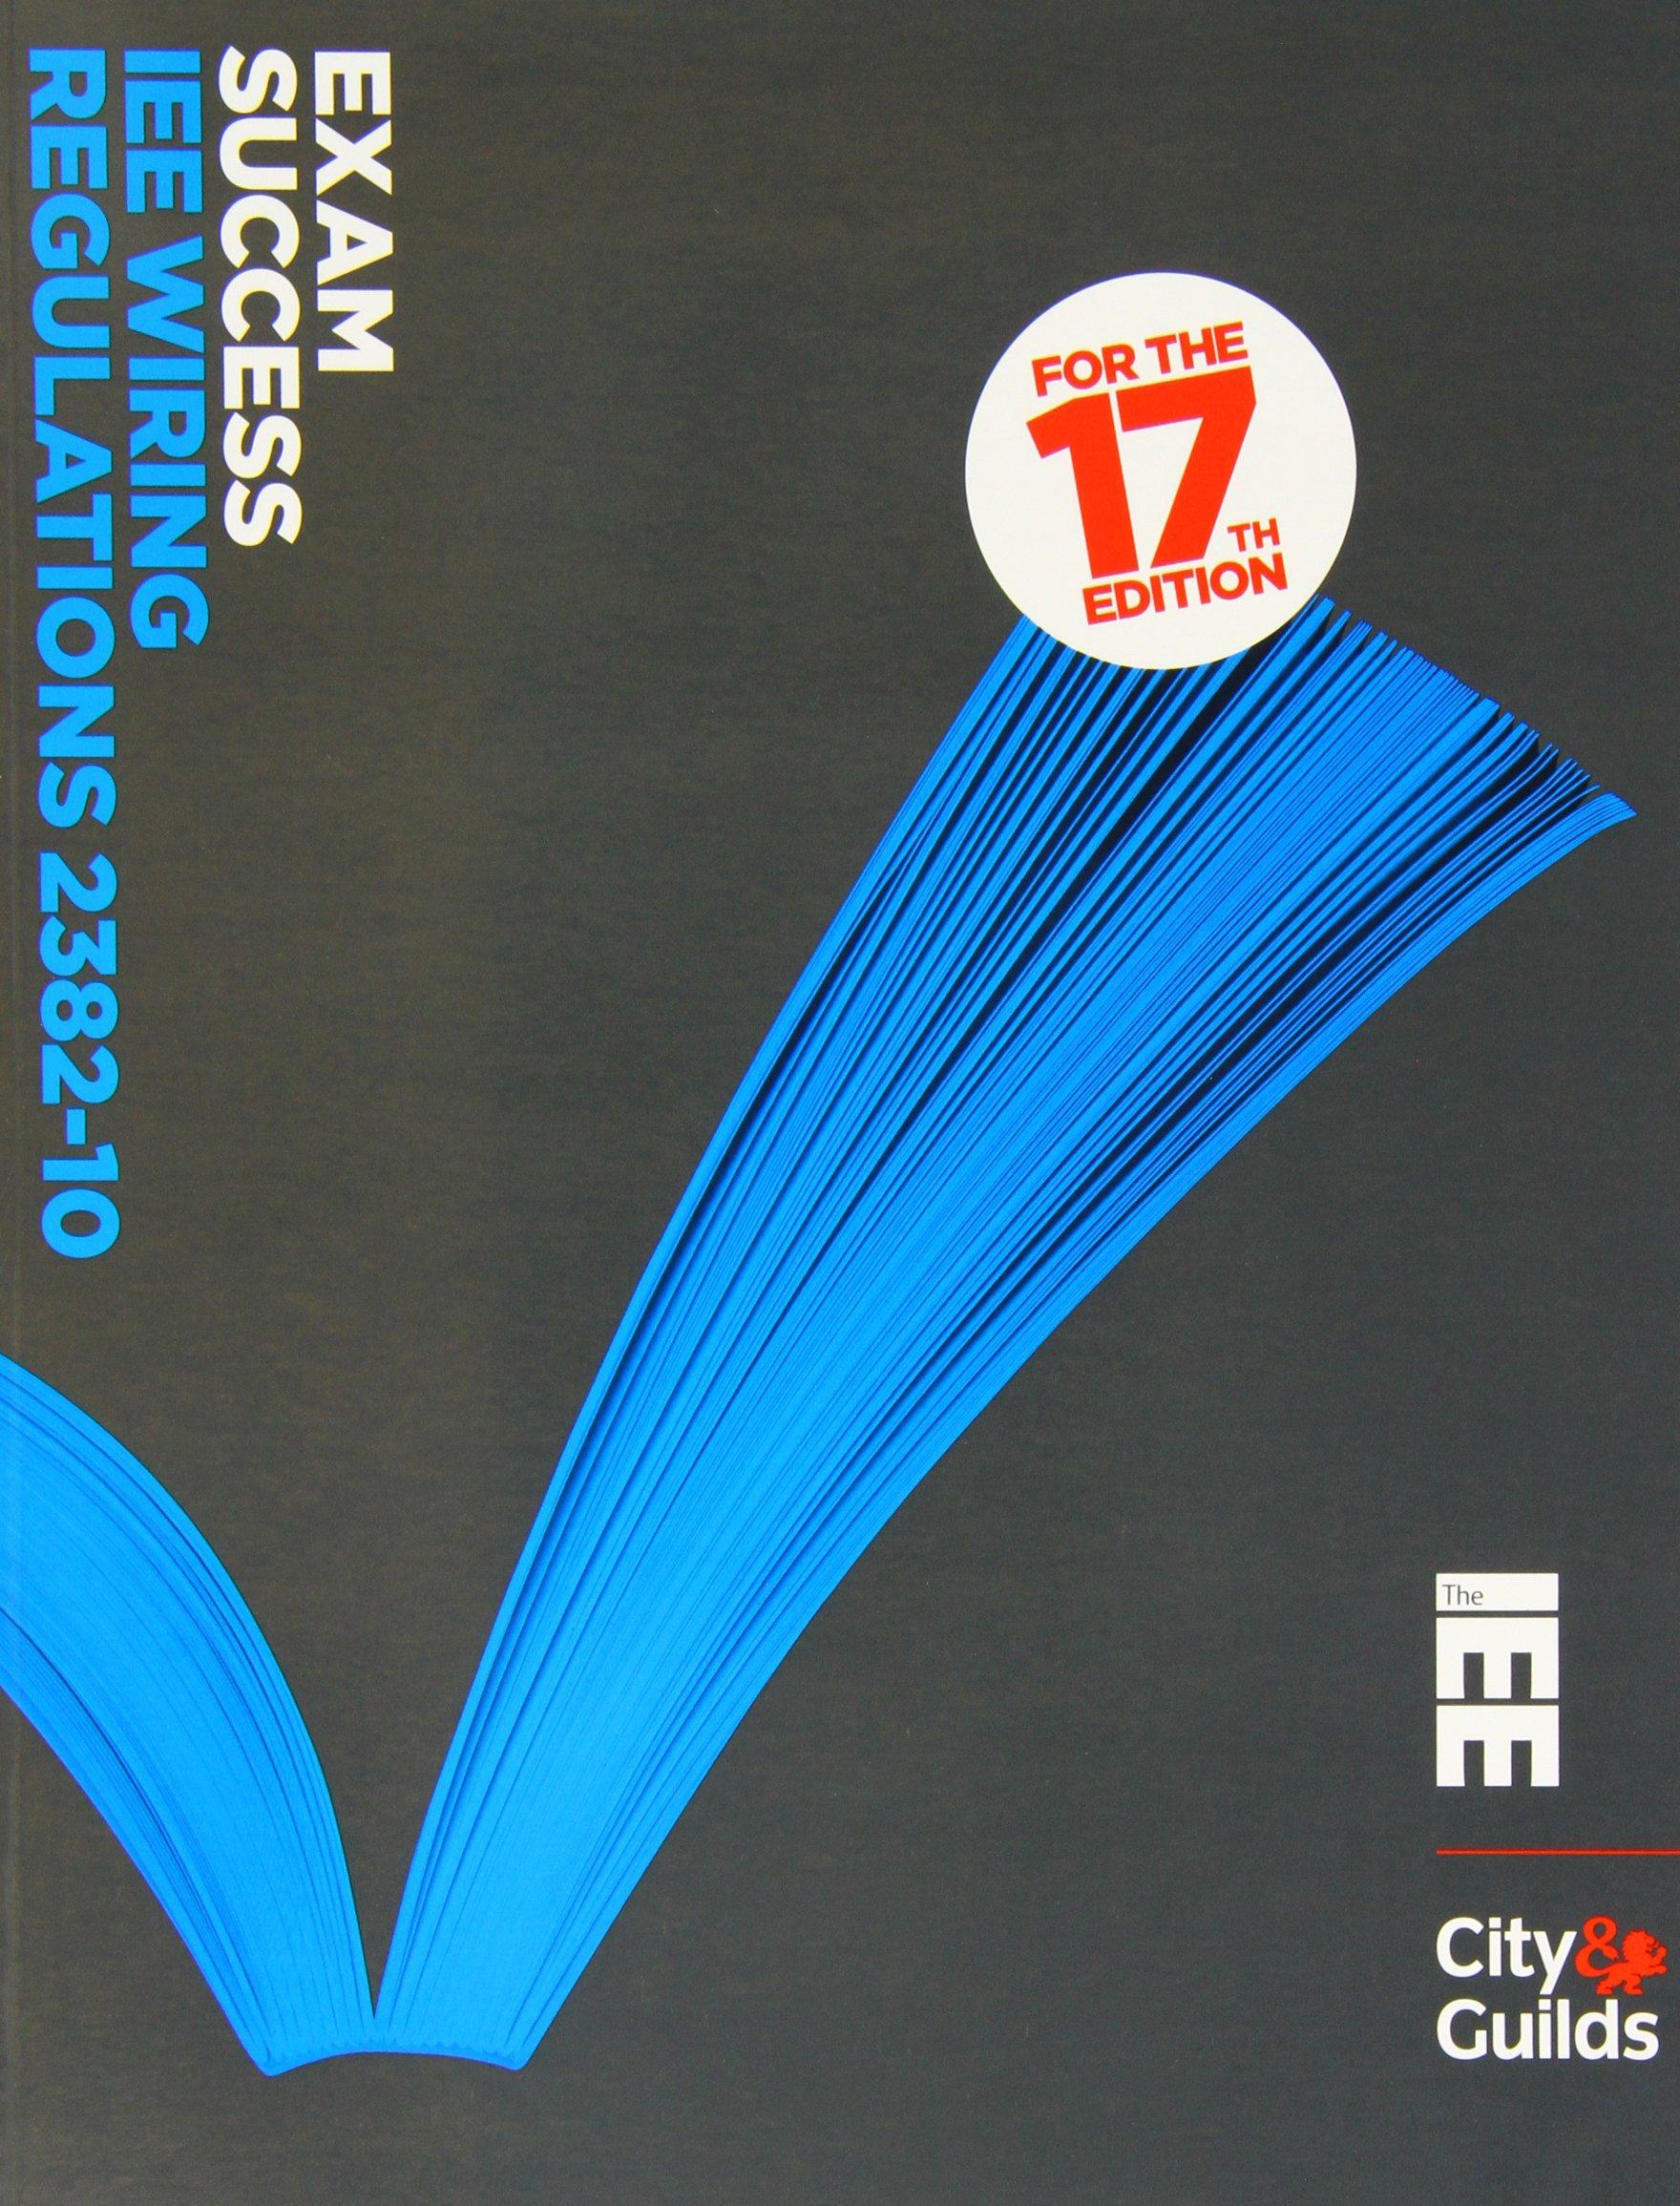 Exam Success Iee Wiring Regulations 2382 10 Paul Iet Regs Books Cook Jonathon Elliot 9780863418853